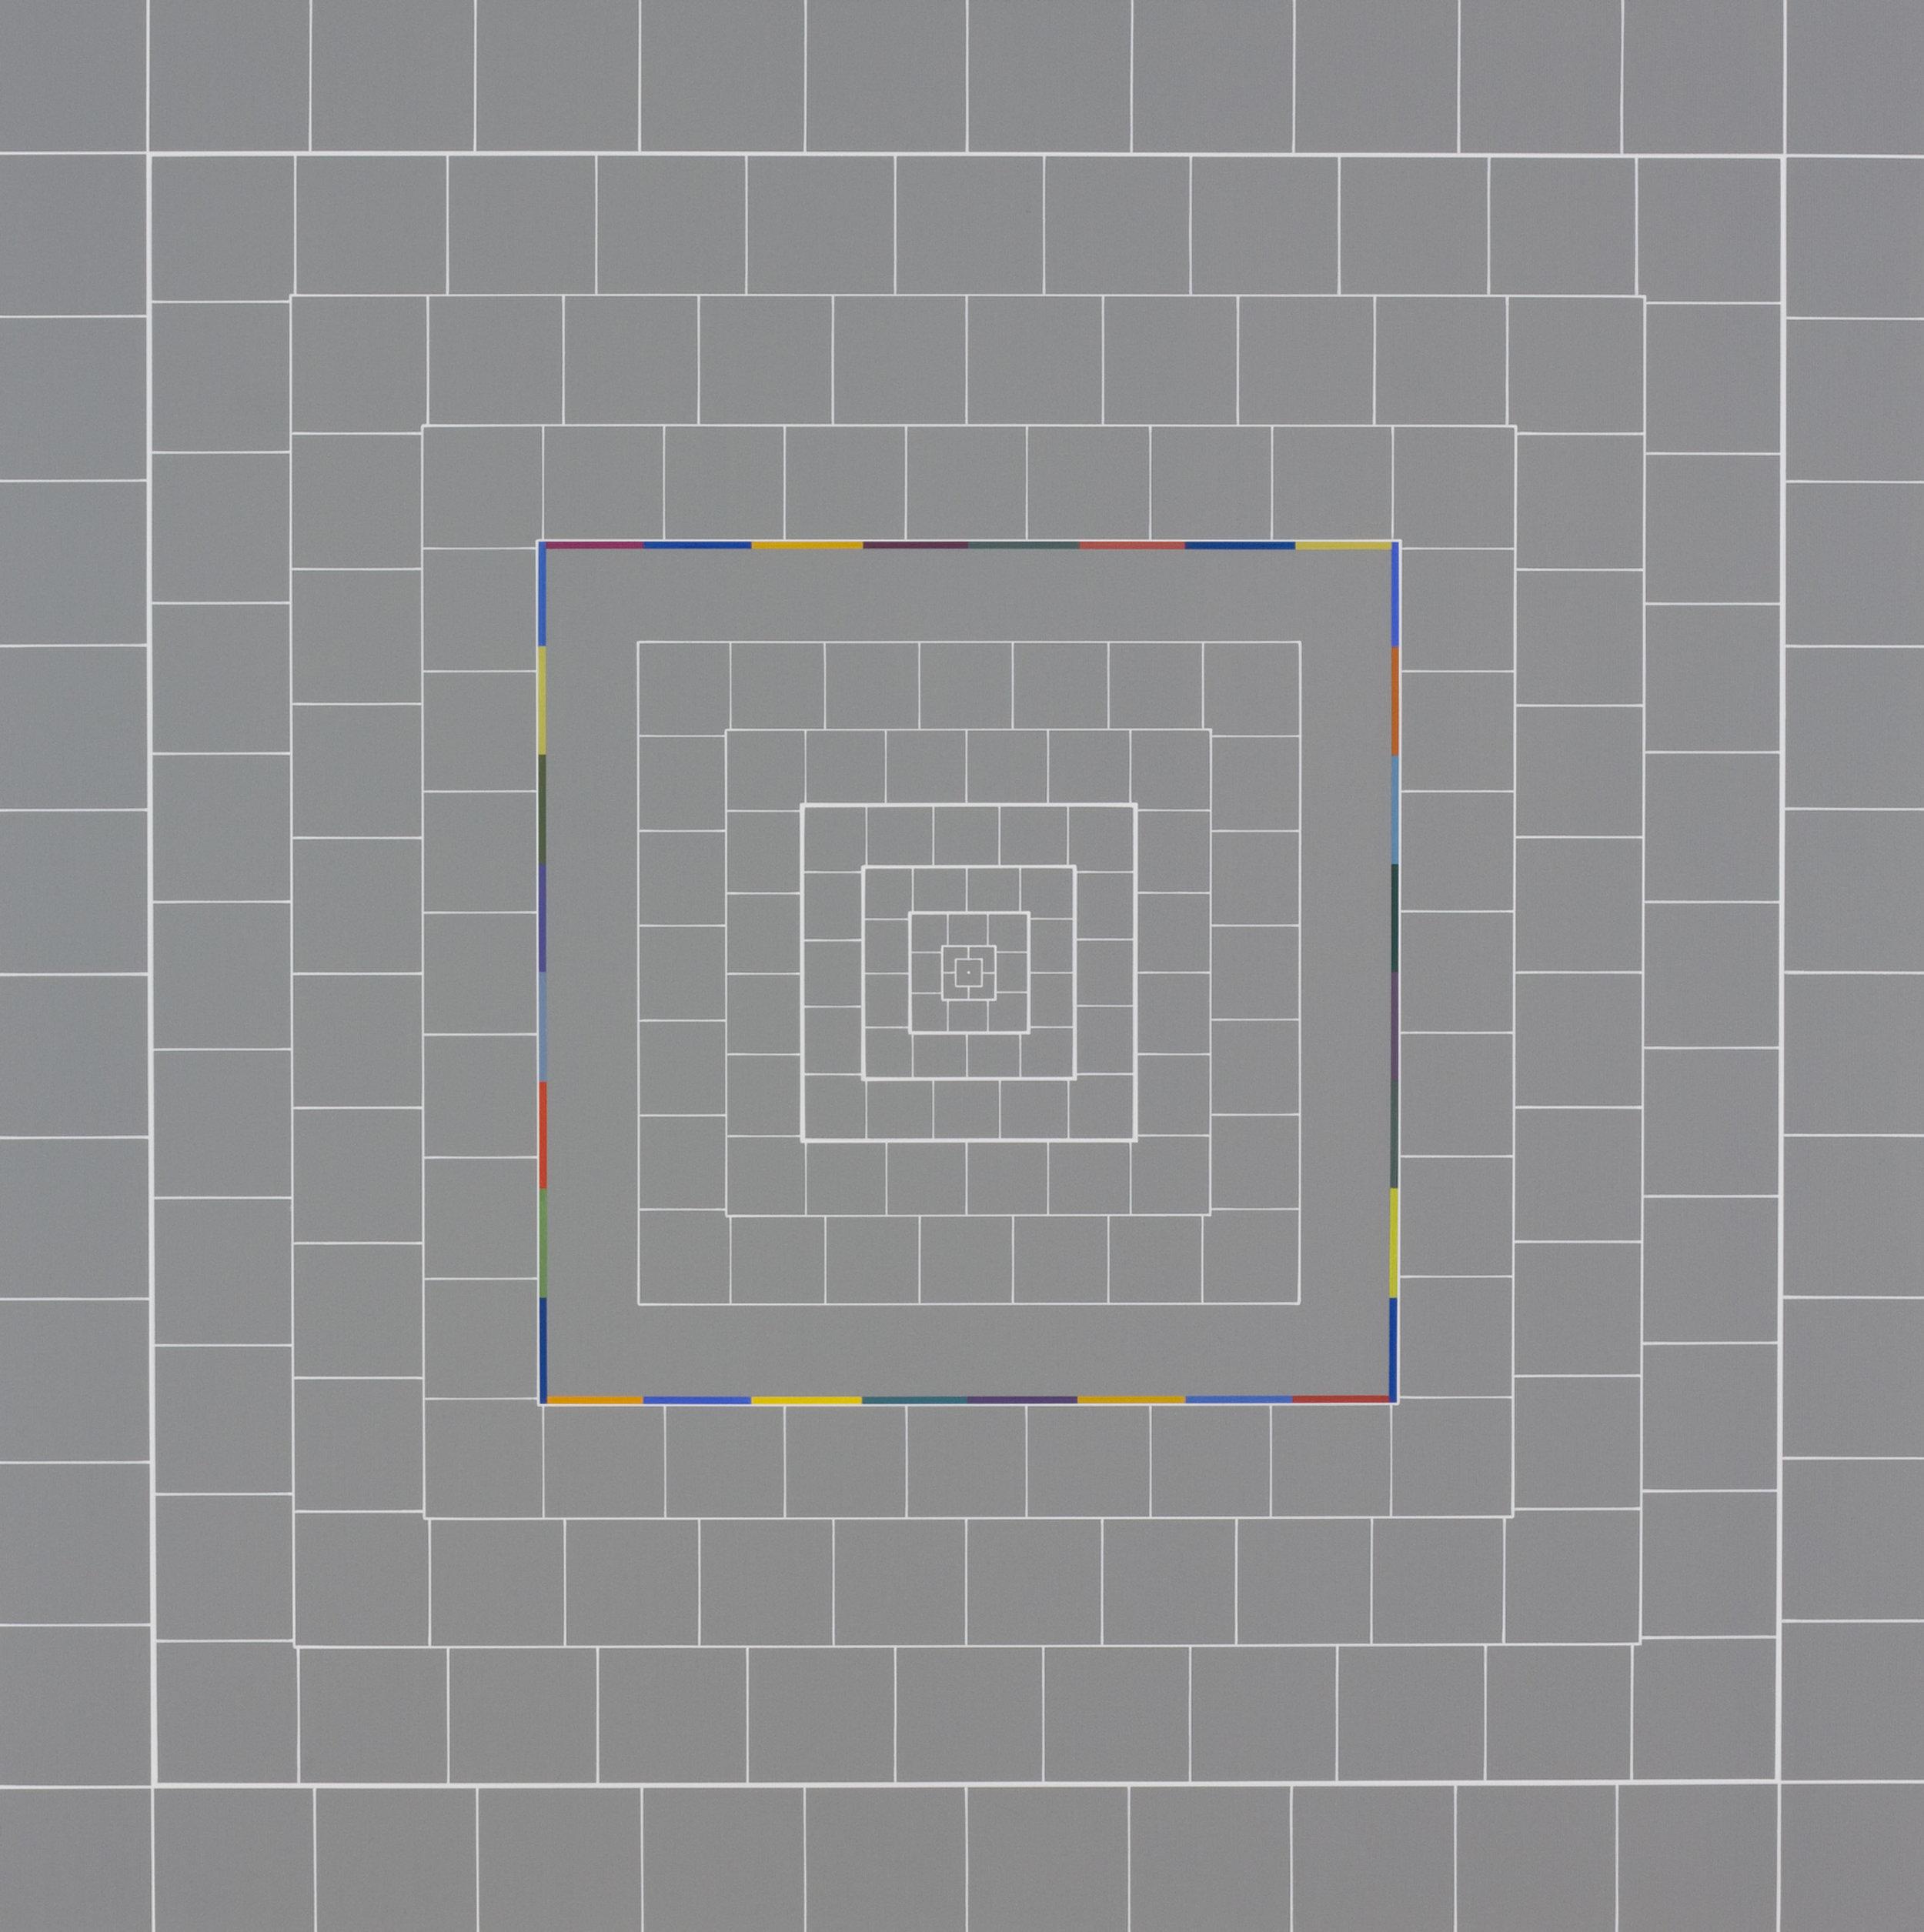 Yantra-ipsum-creator(1)2013.Feb, acrylic on canvas, 31 1/2 x 31 1/2 in. [80x80cm]